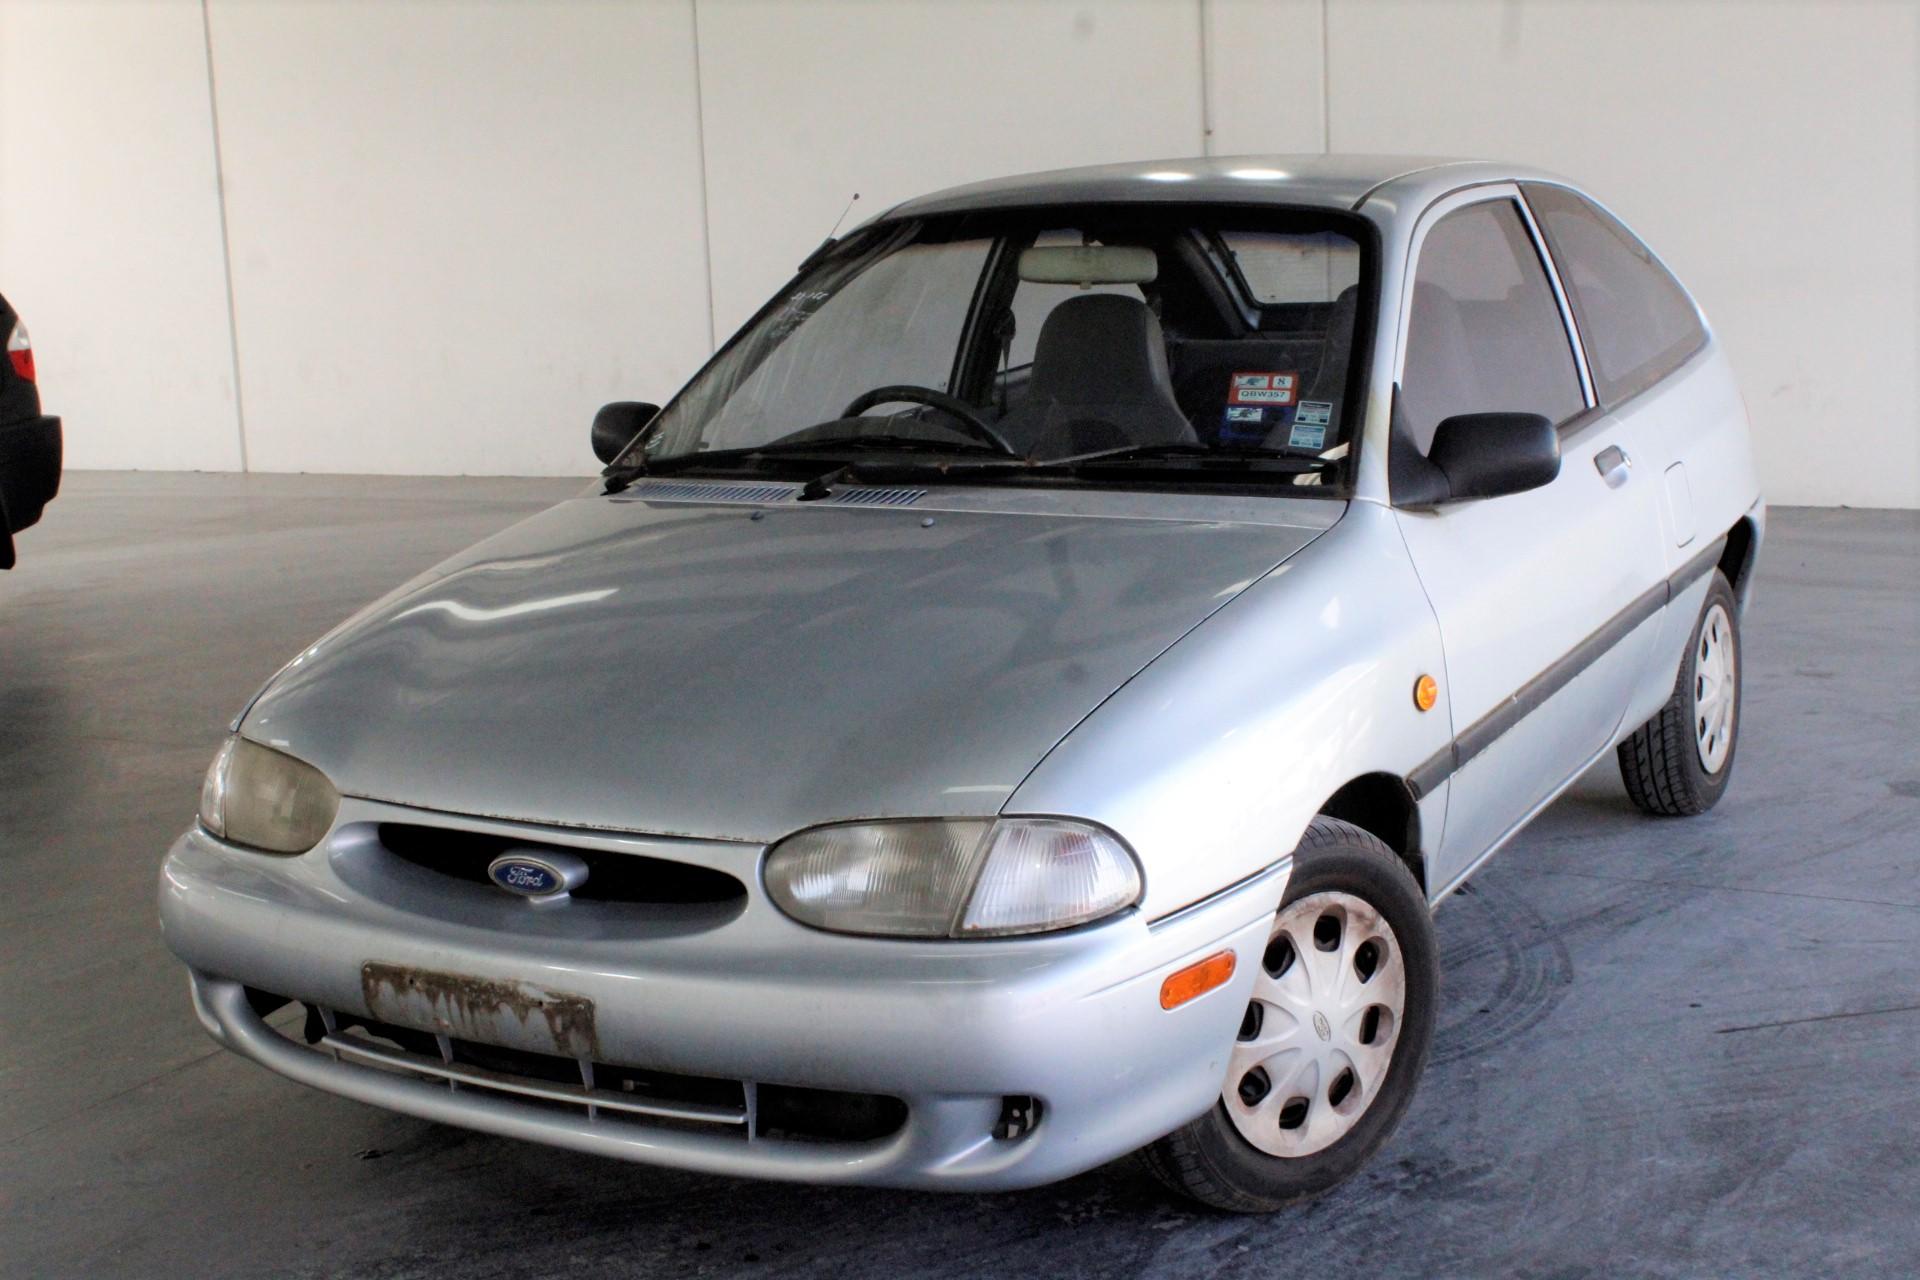 1999 Ford Festiva TRIO S WF Automatic Hatchback